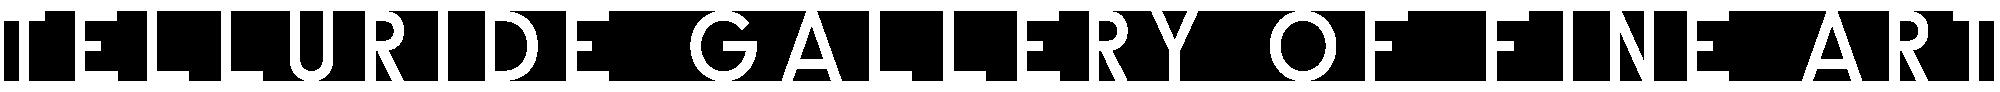 TellurideGallery_wordmark